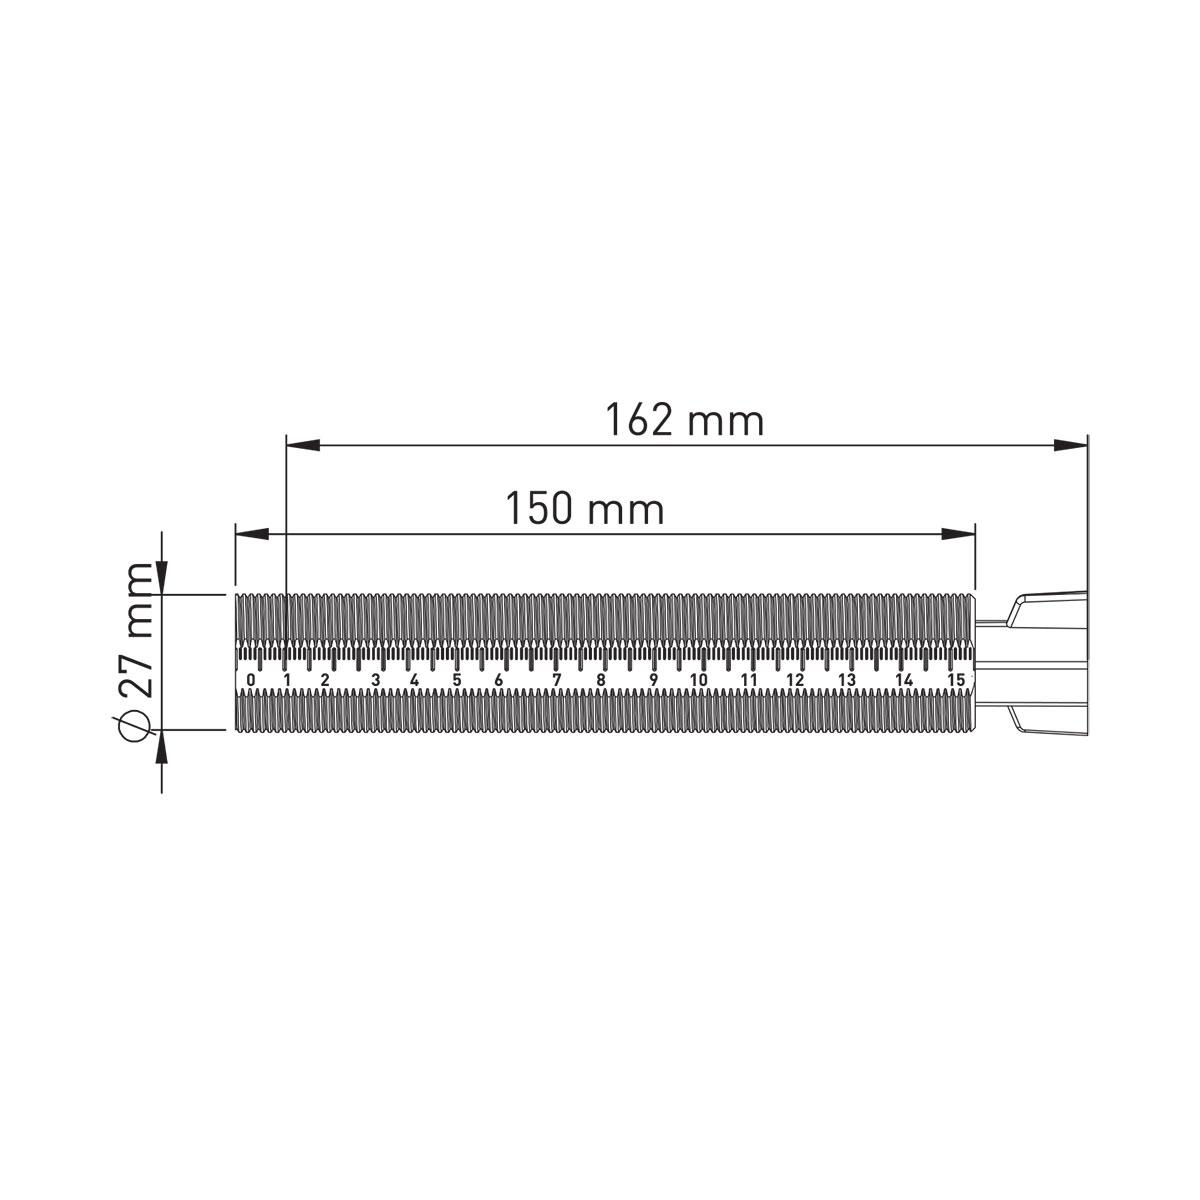 Yuvarlak Başlıklı Ankastre Ara Kesme Valf  – 25 mm